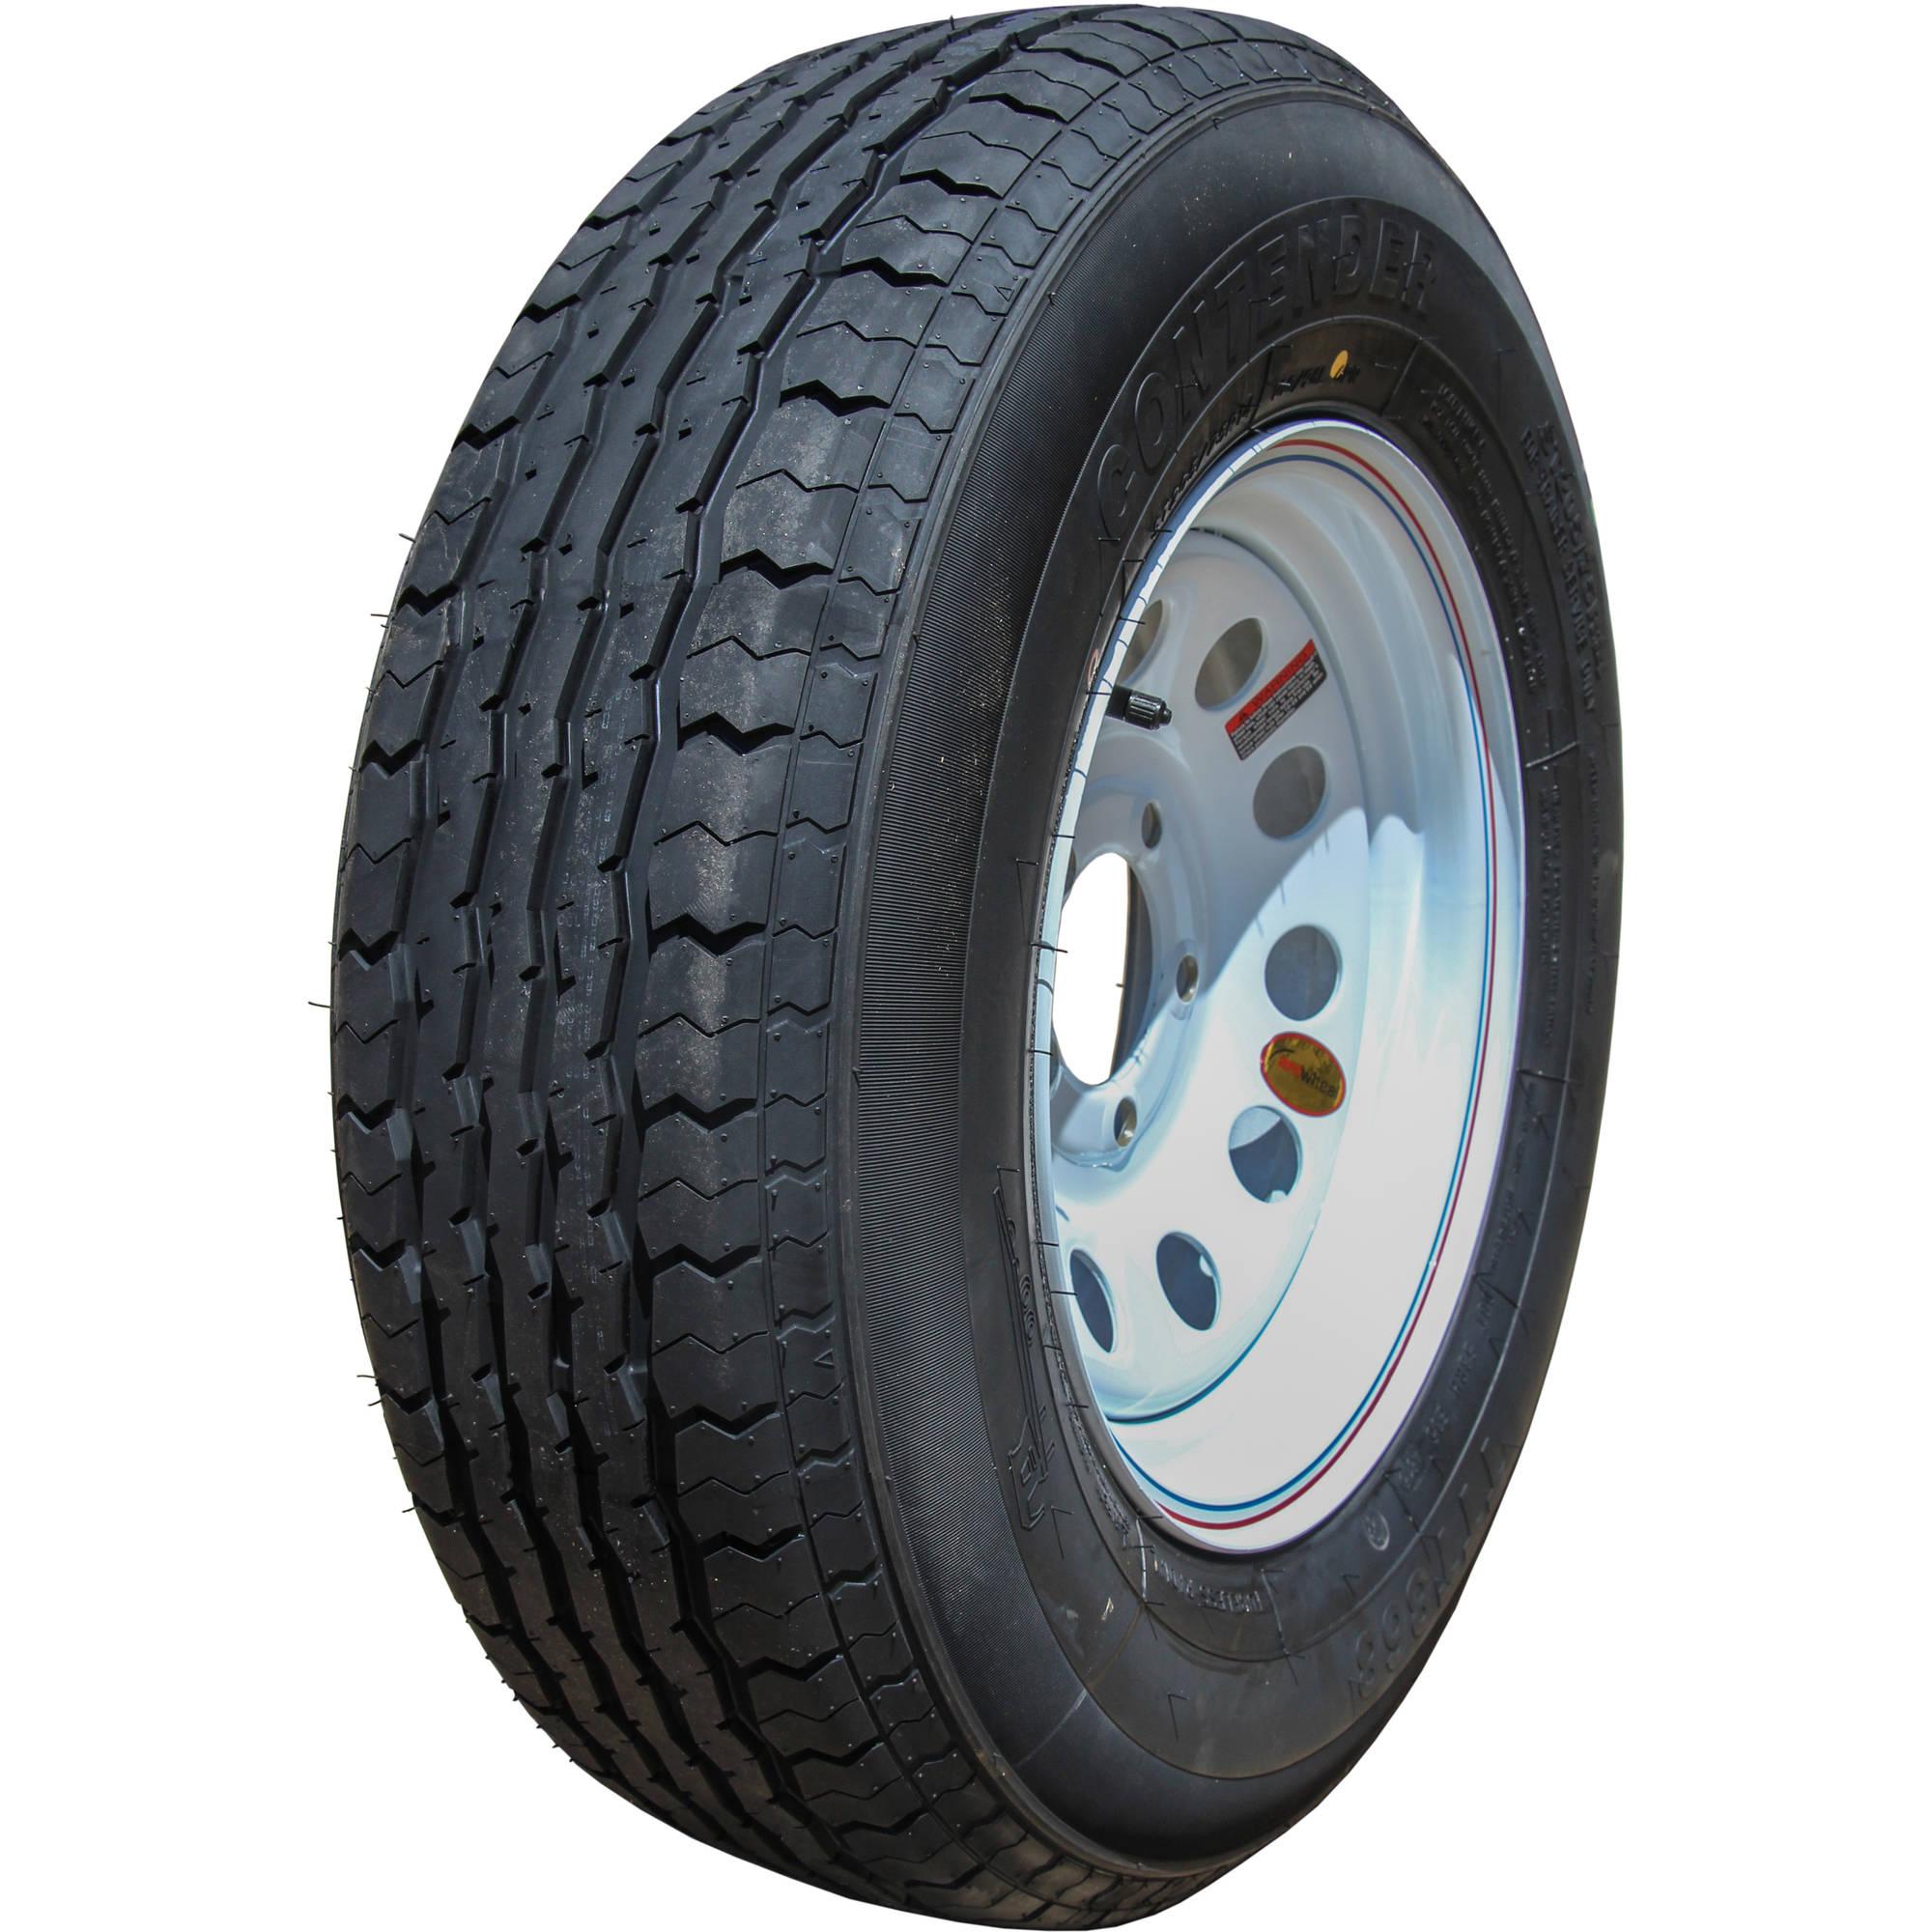 ST205/75R14, Load Range C, Trailer Tire